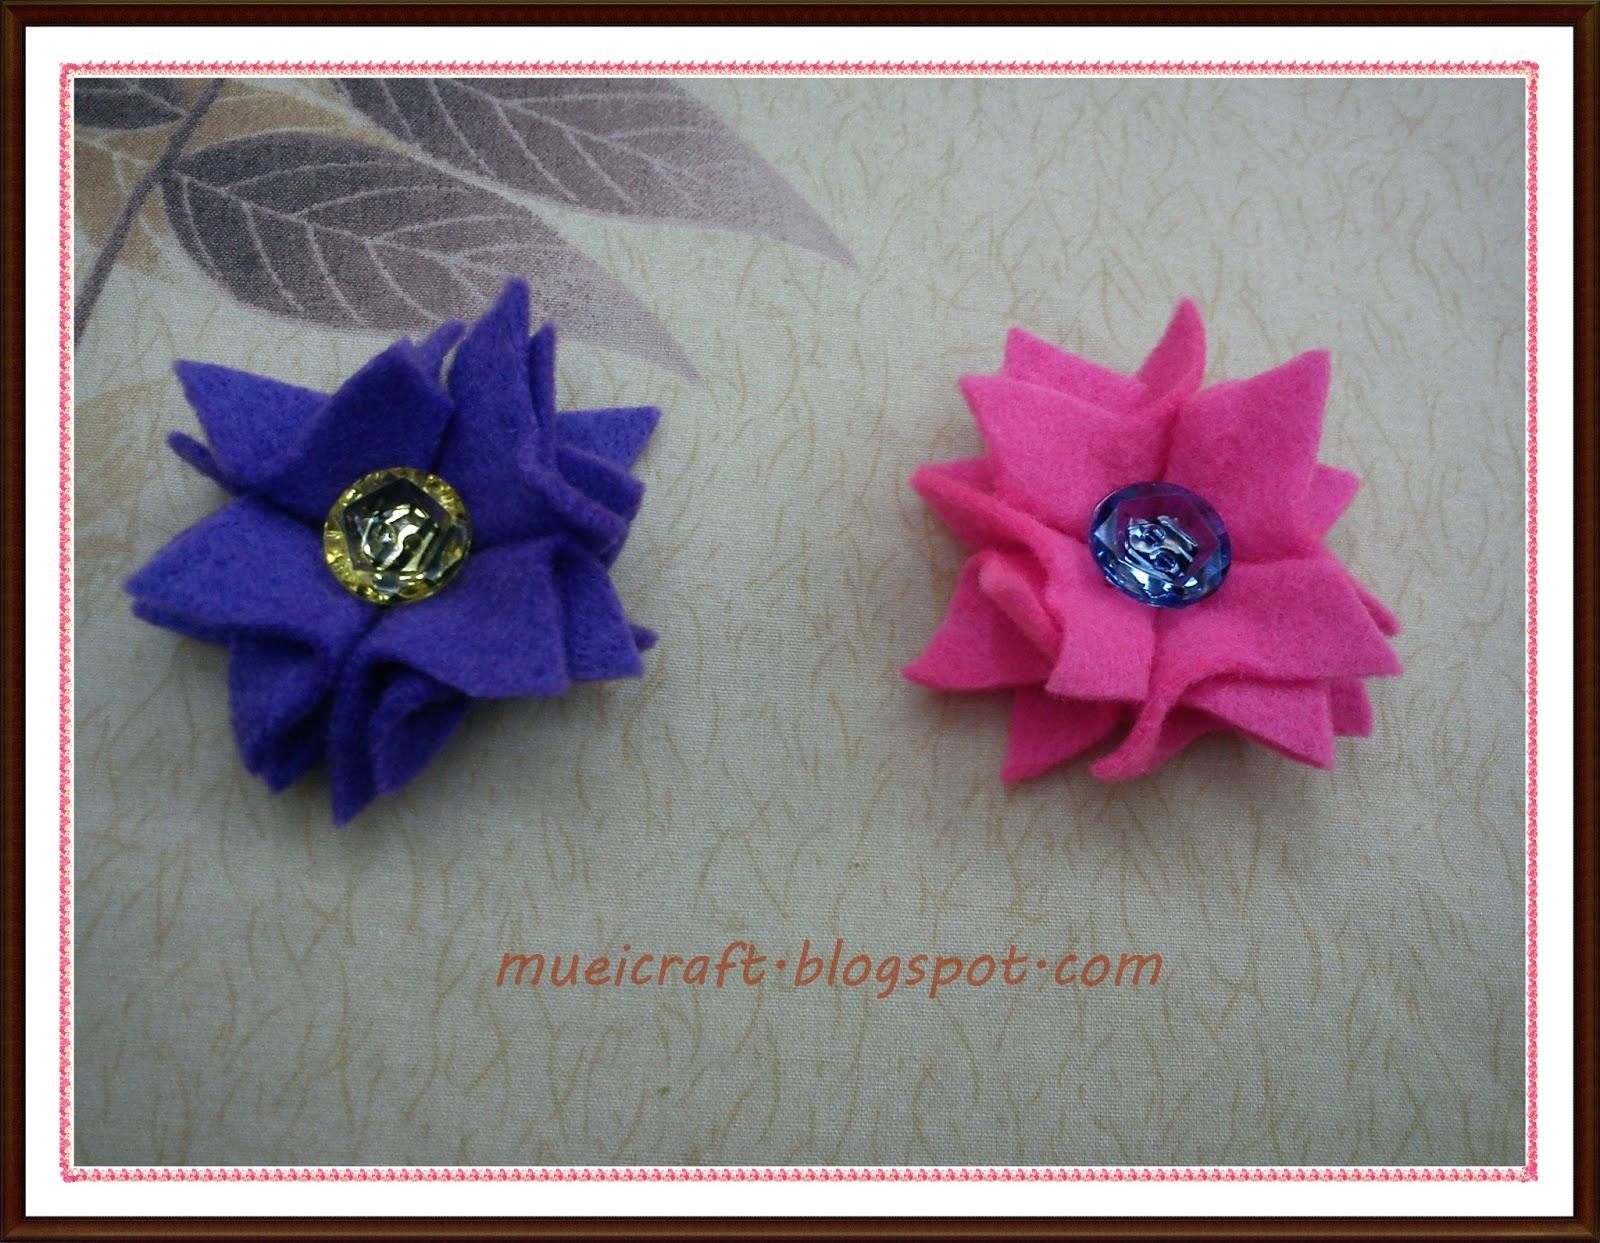 terbaru : kreasi flanel bros bunga / Felt flowers pins